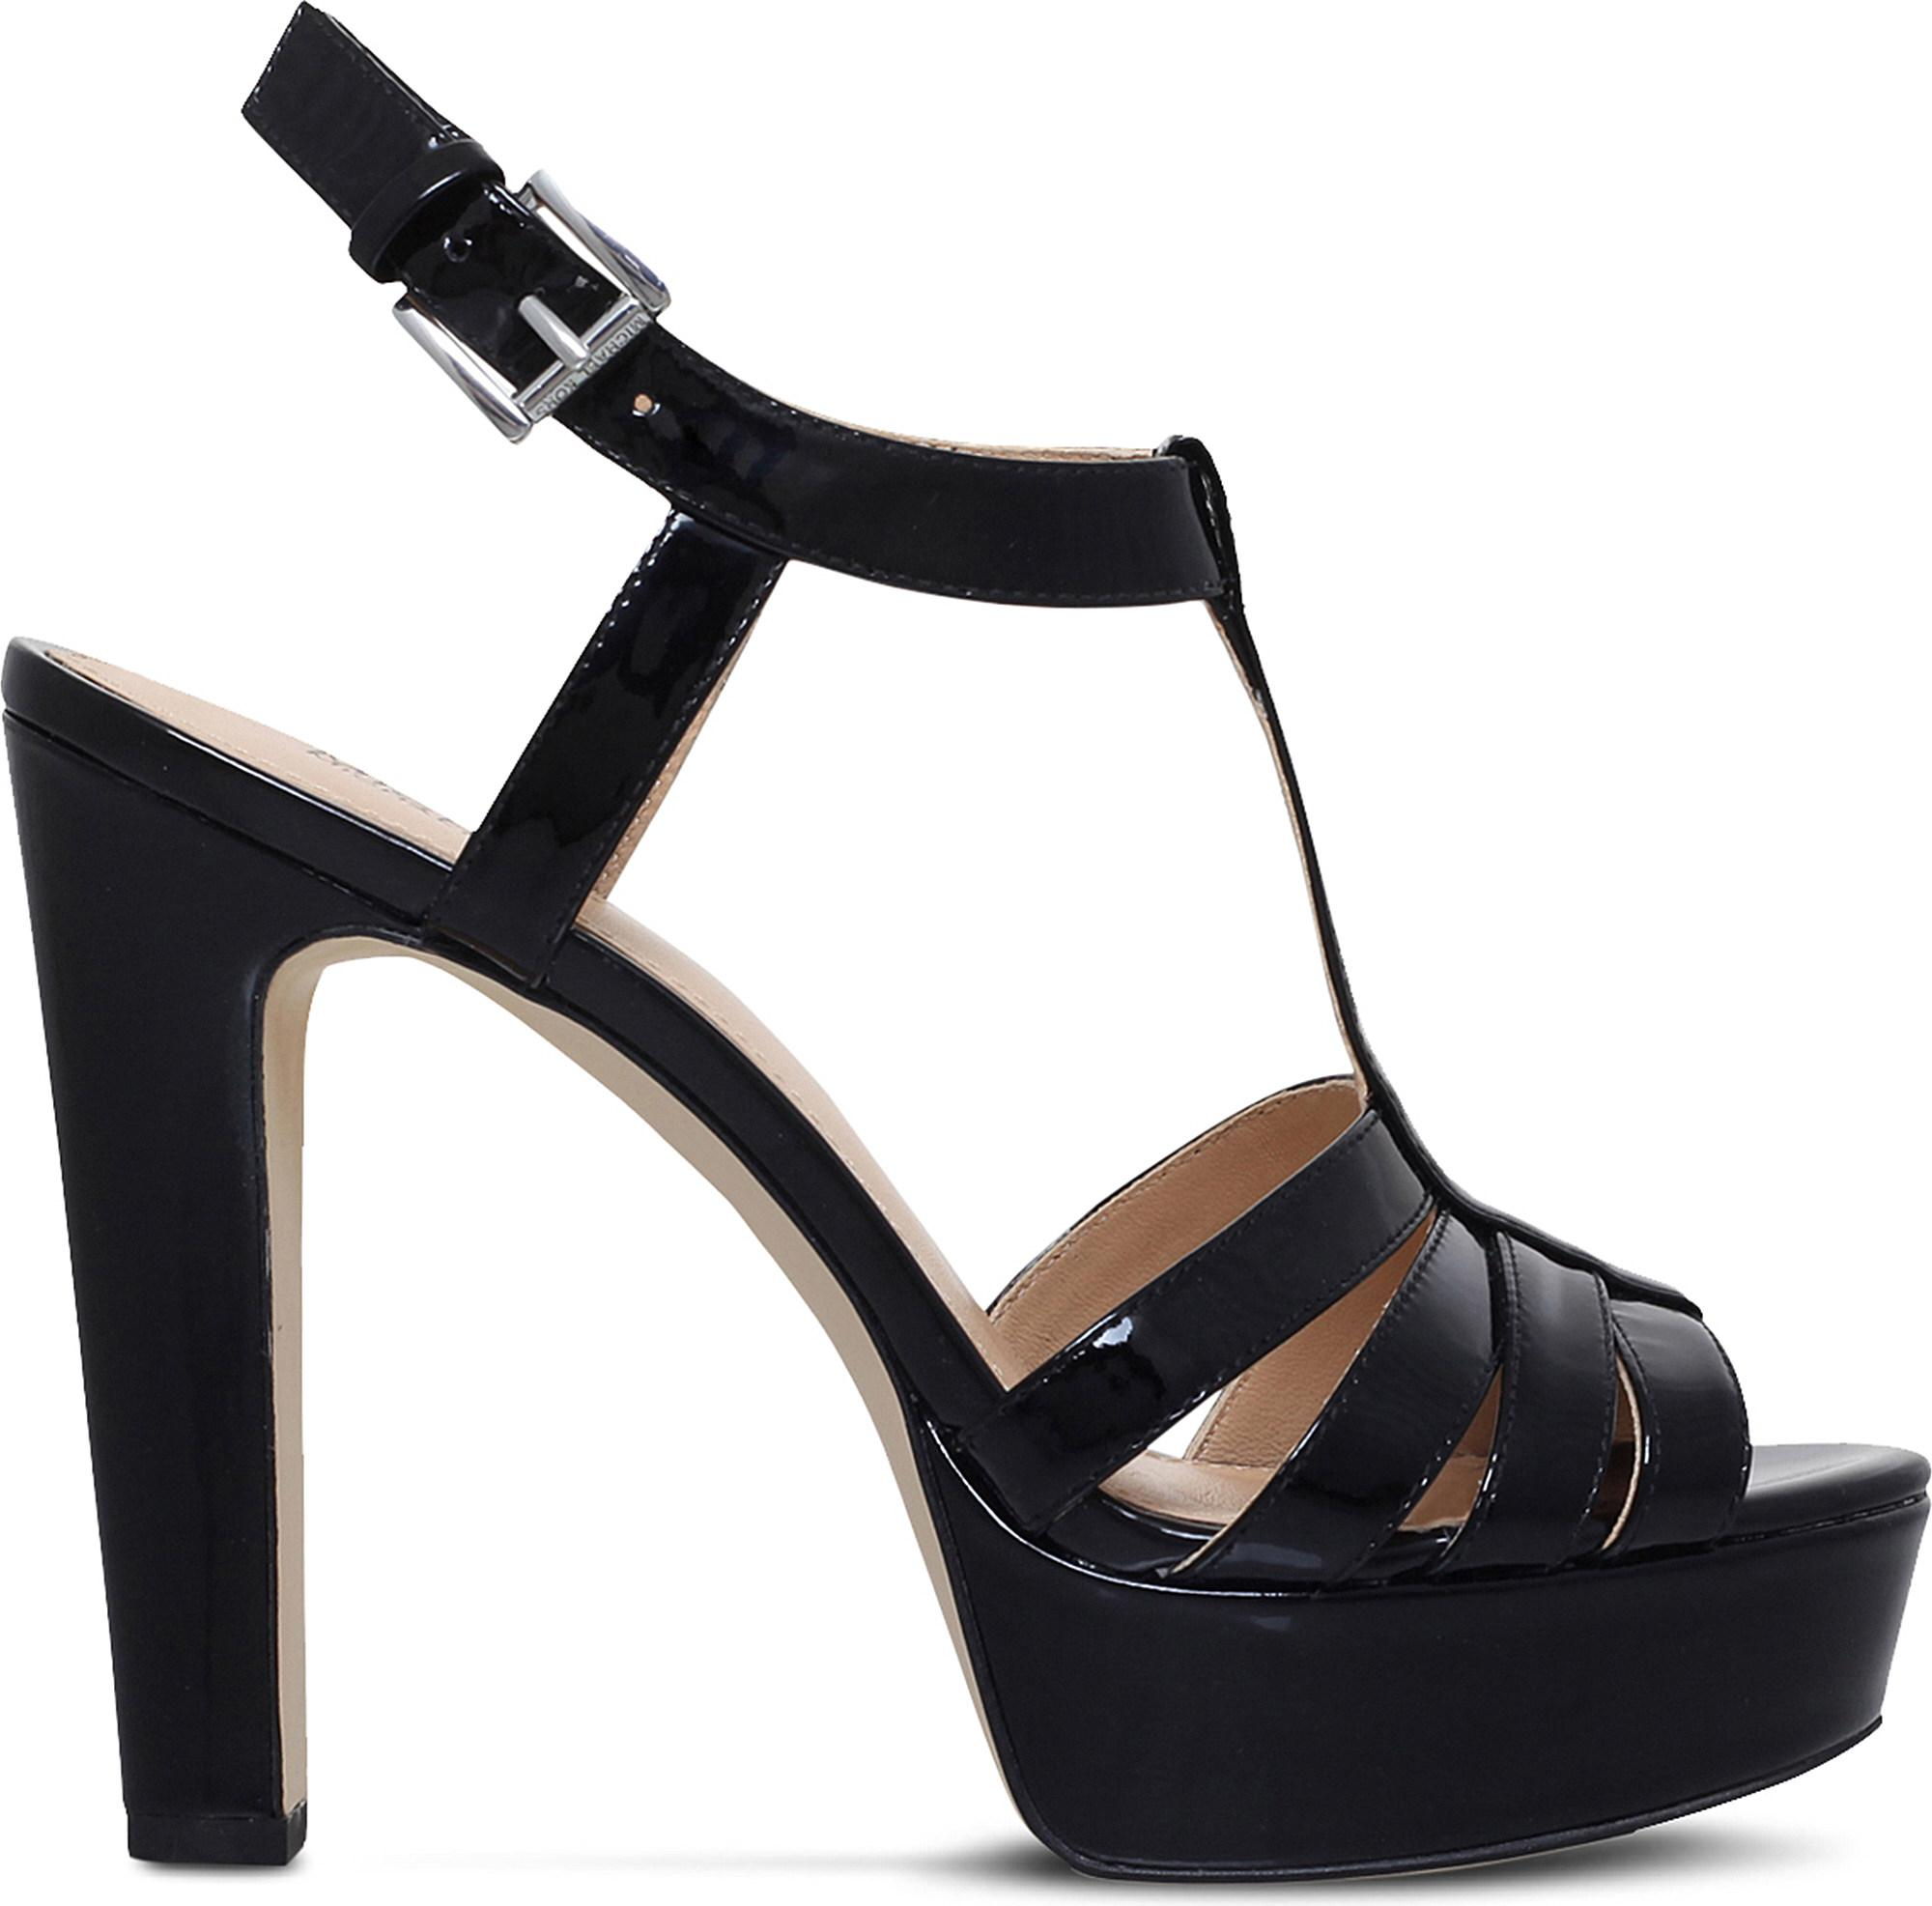 db8c62ae17f Lyst - MICHAEL Michael Kors Catalina Patent Leather Platform Sandals ...